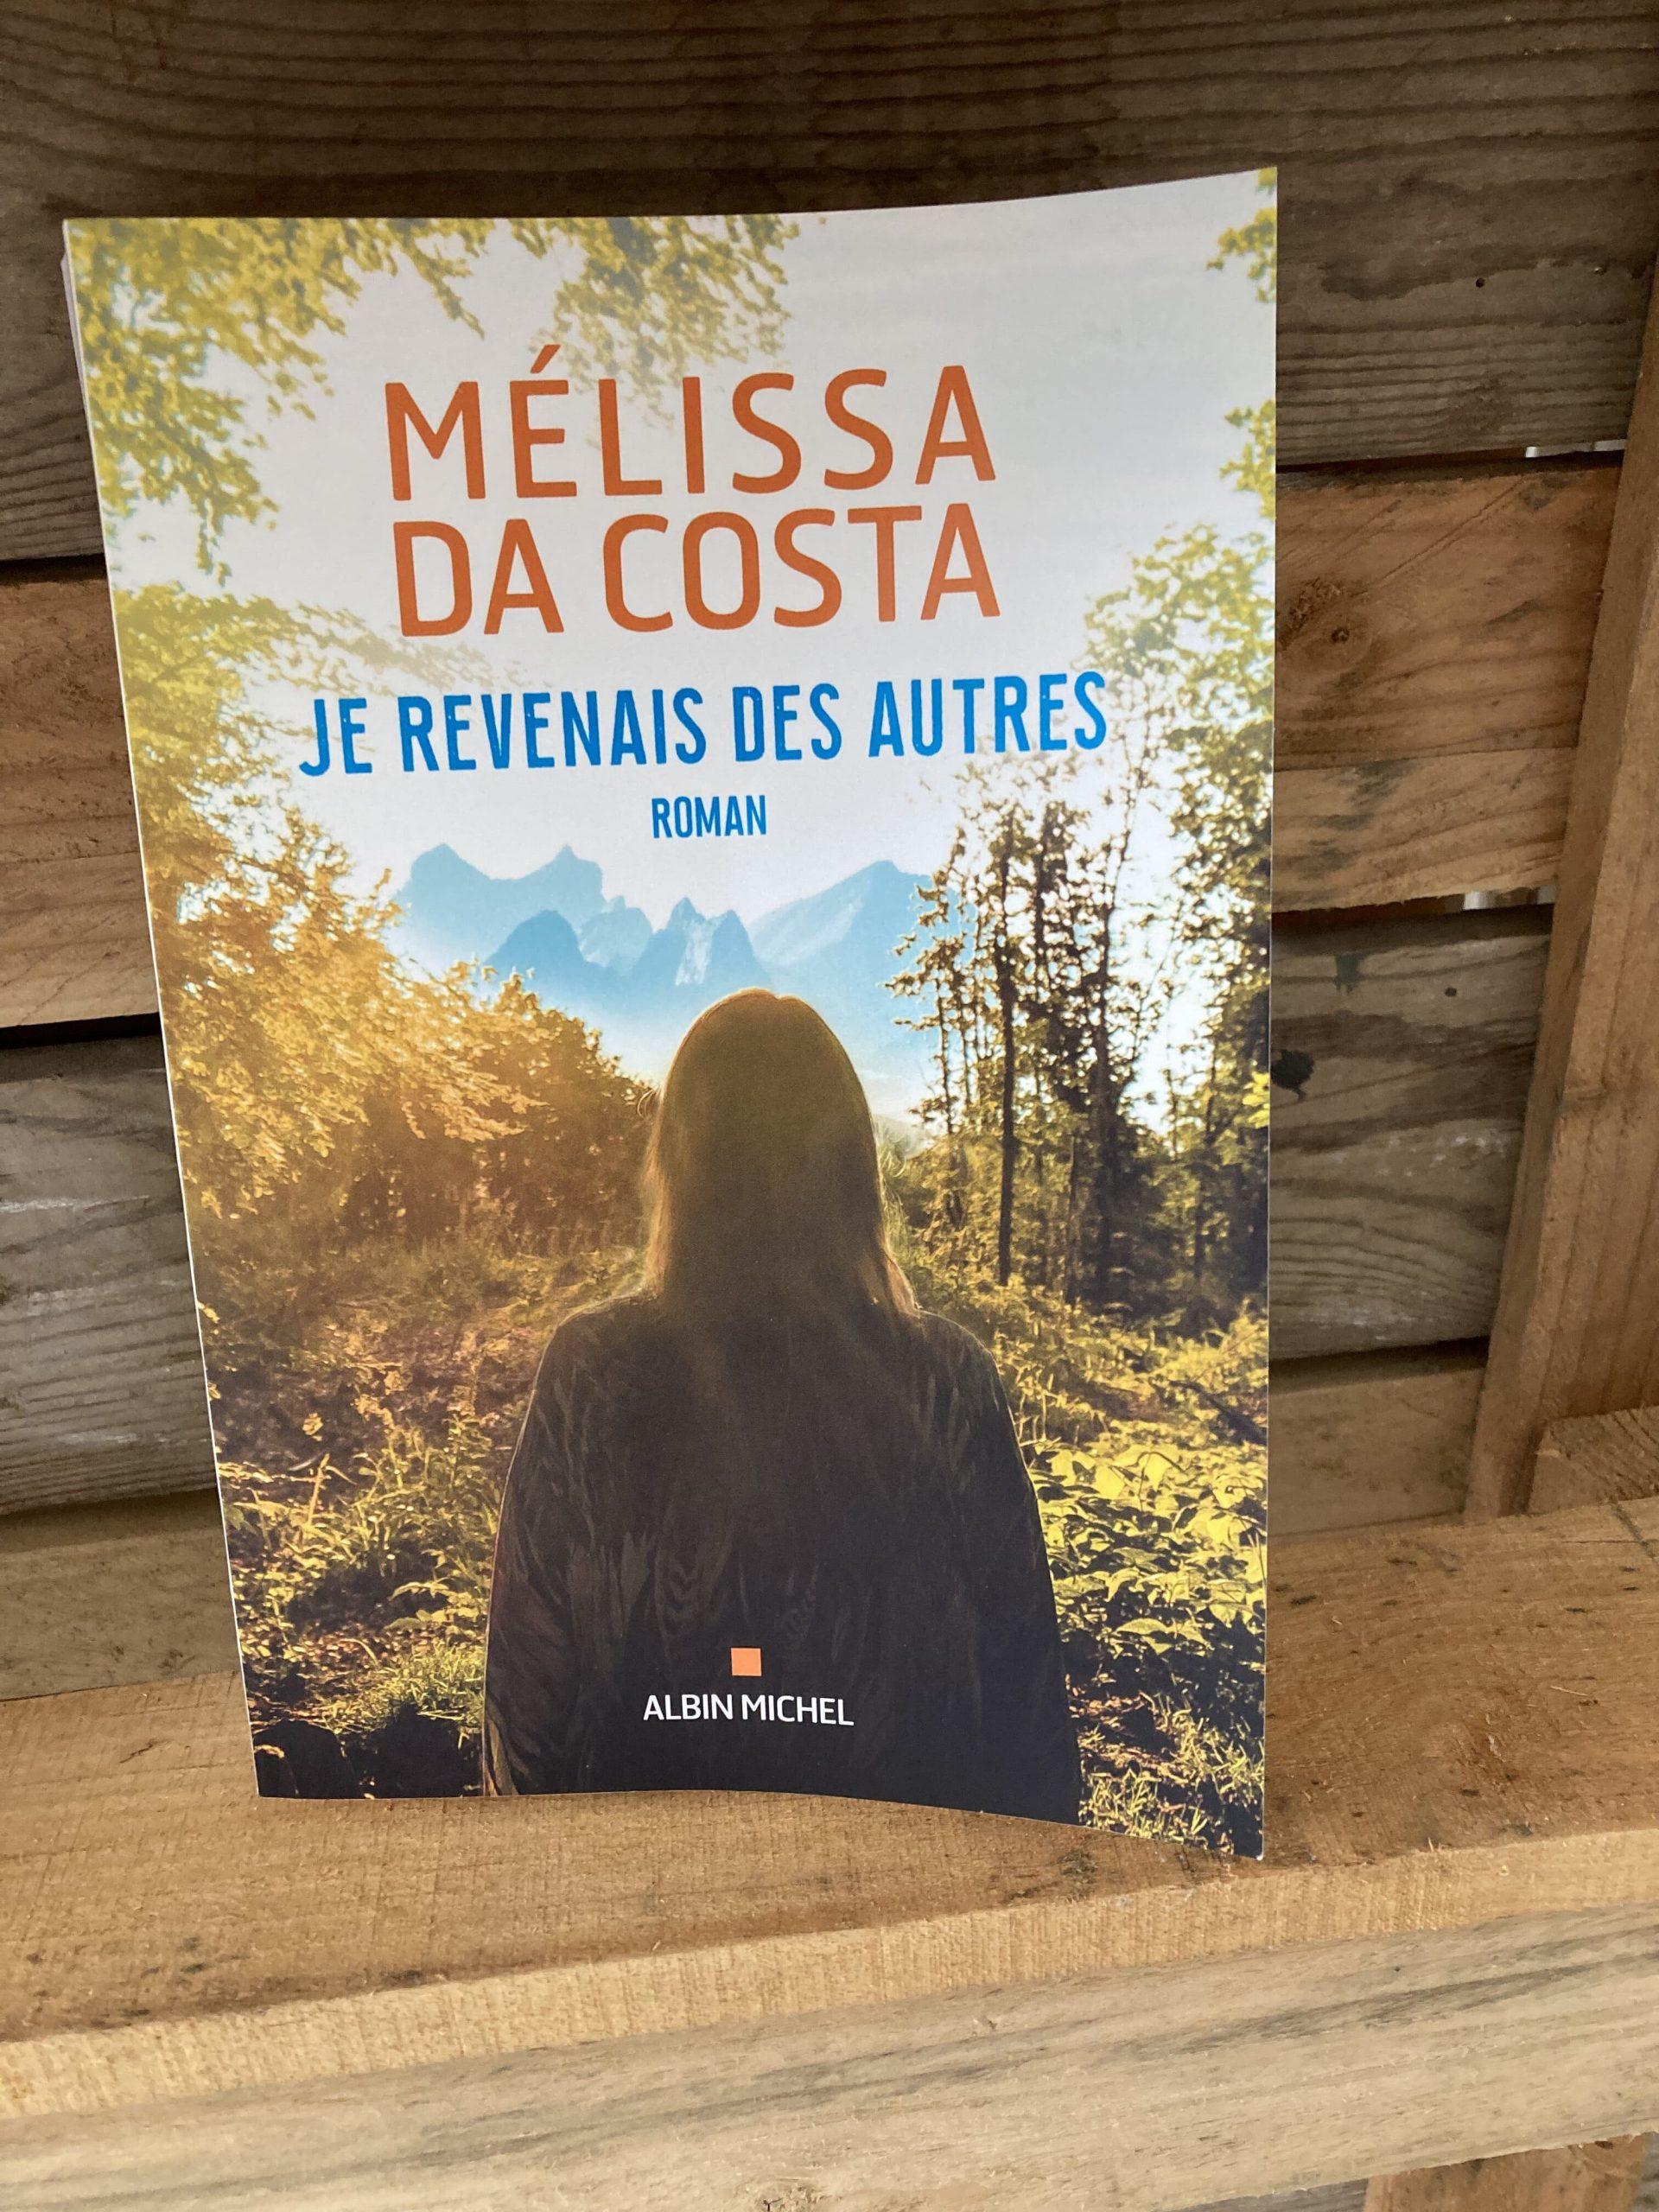 Livre de Mélissa Da Costa, Je revenais des autres